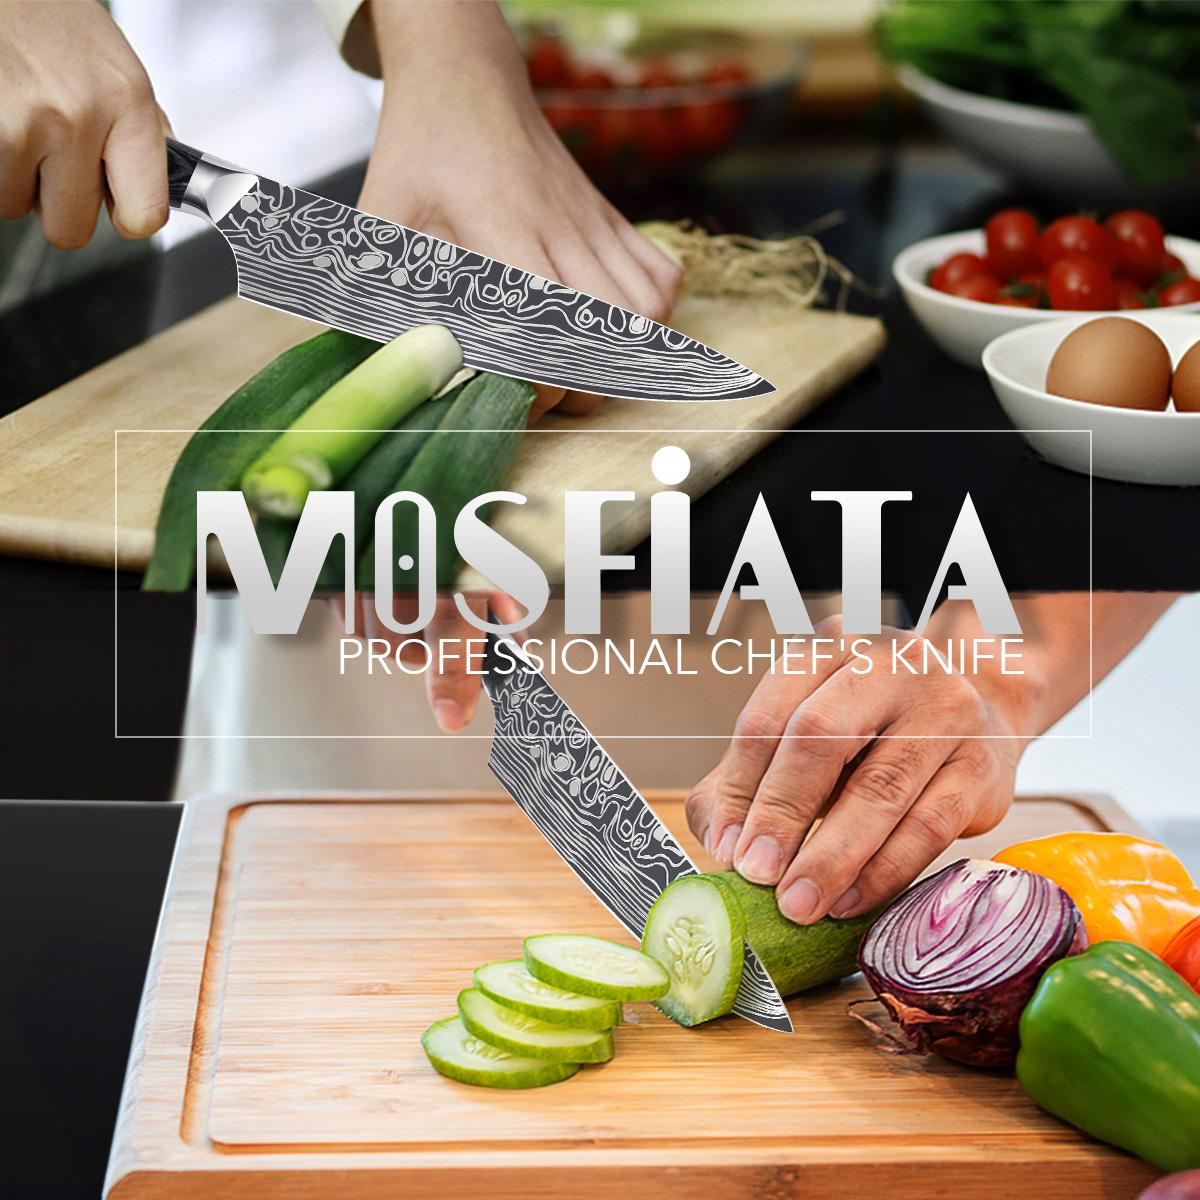 mosfiata knife 03.jpg